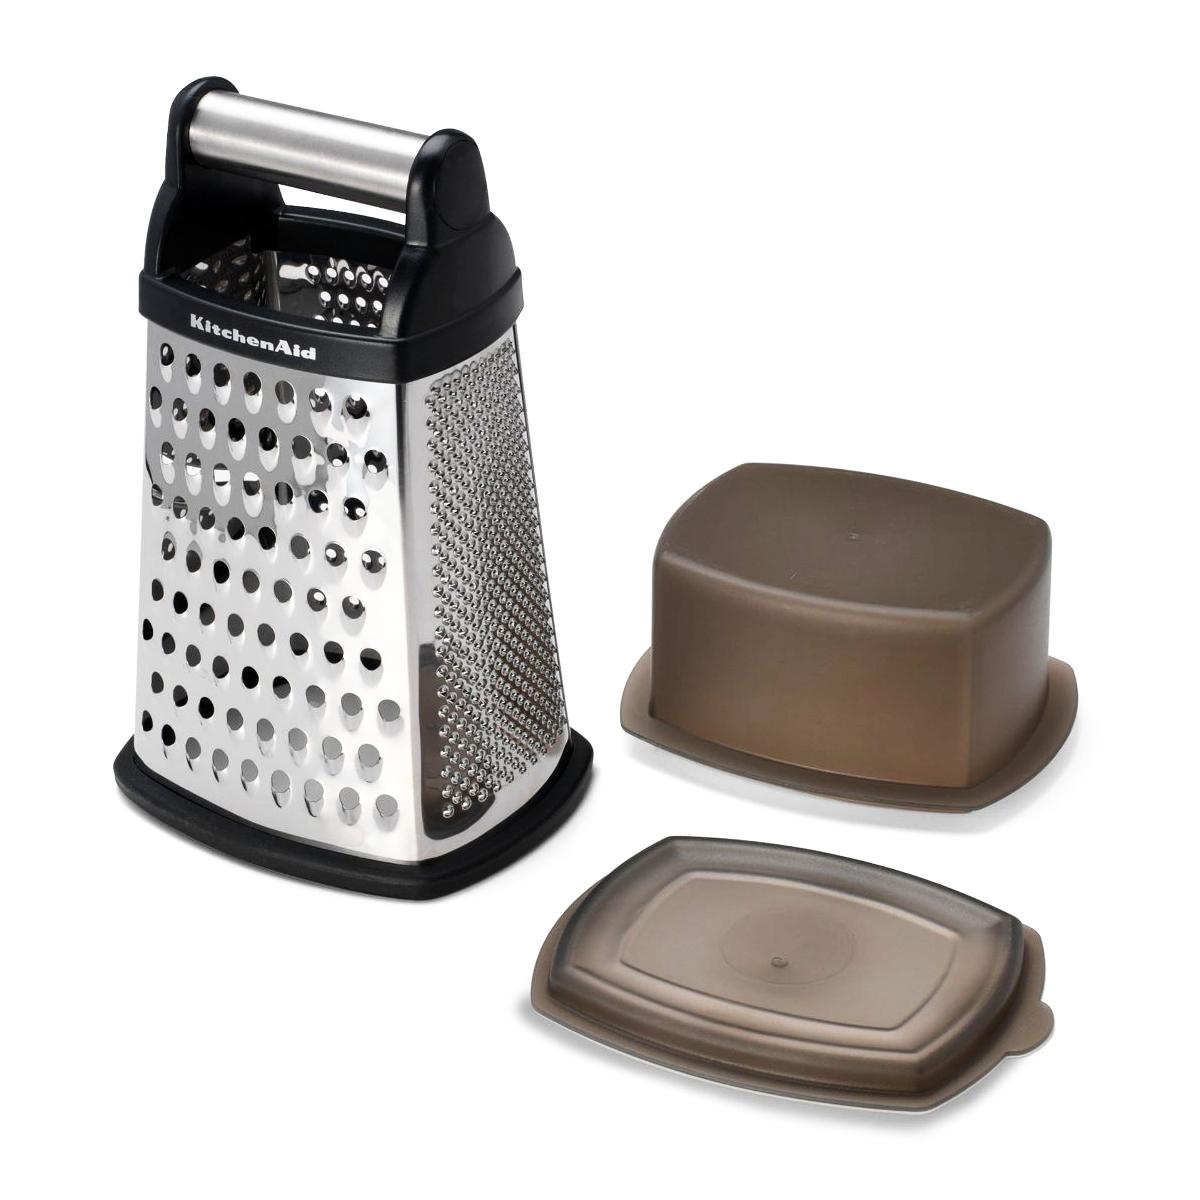 Kitchenaid Gourmet Stainless Steel Black Box Grater